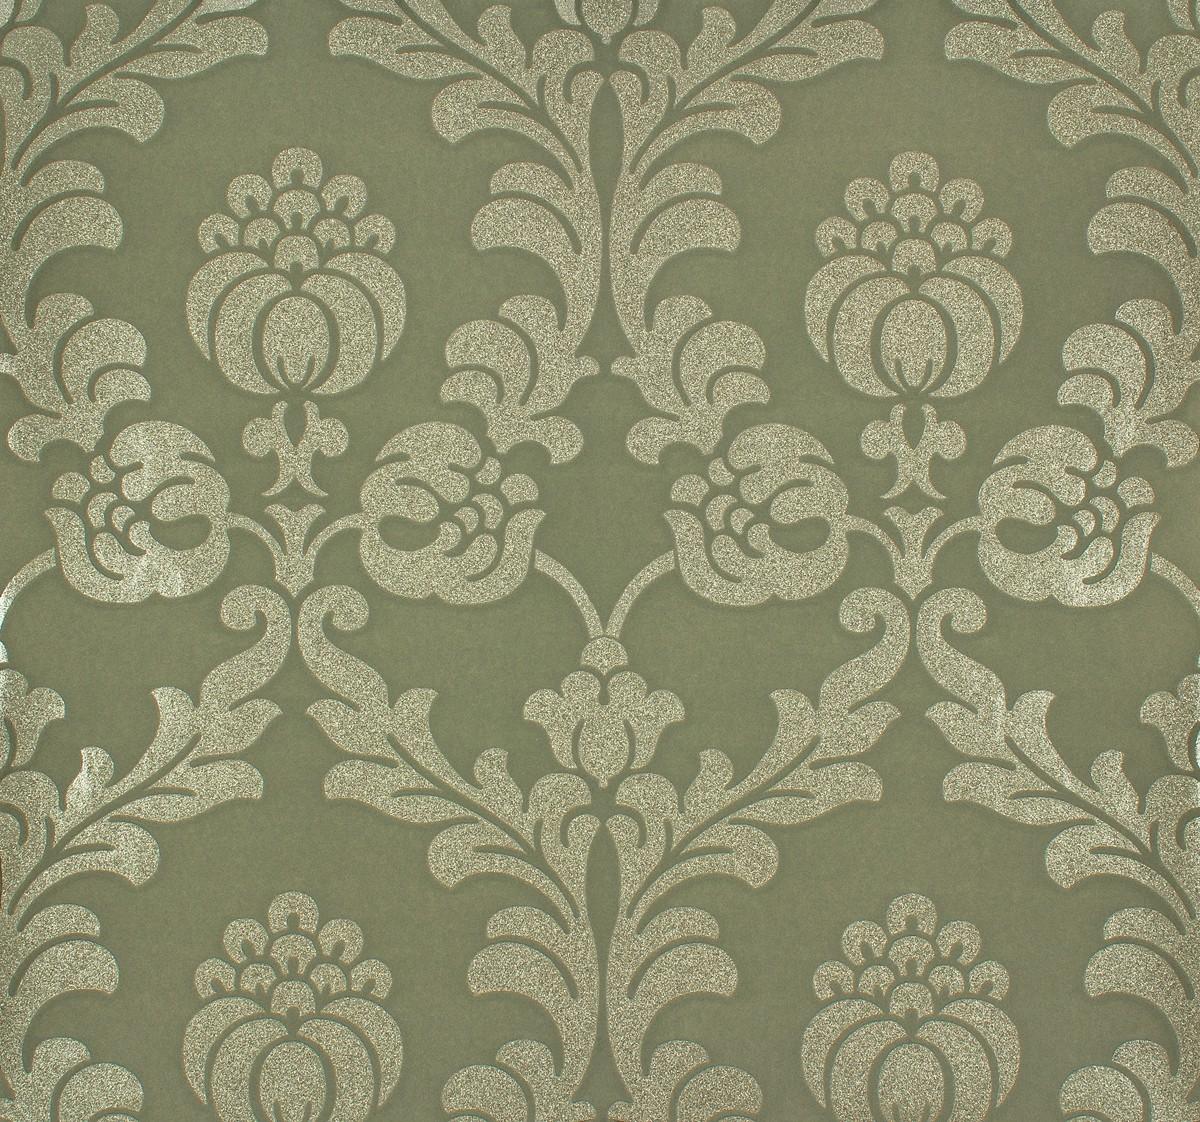 rasch tapete gentle elegance 725889 floral gruen gold metallic. Black Bedroom Furniture Sets. Home Design Ideas